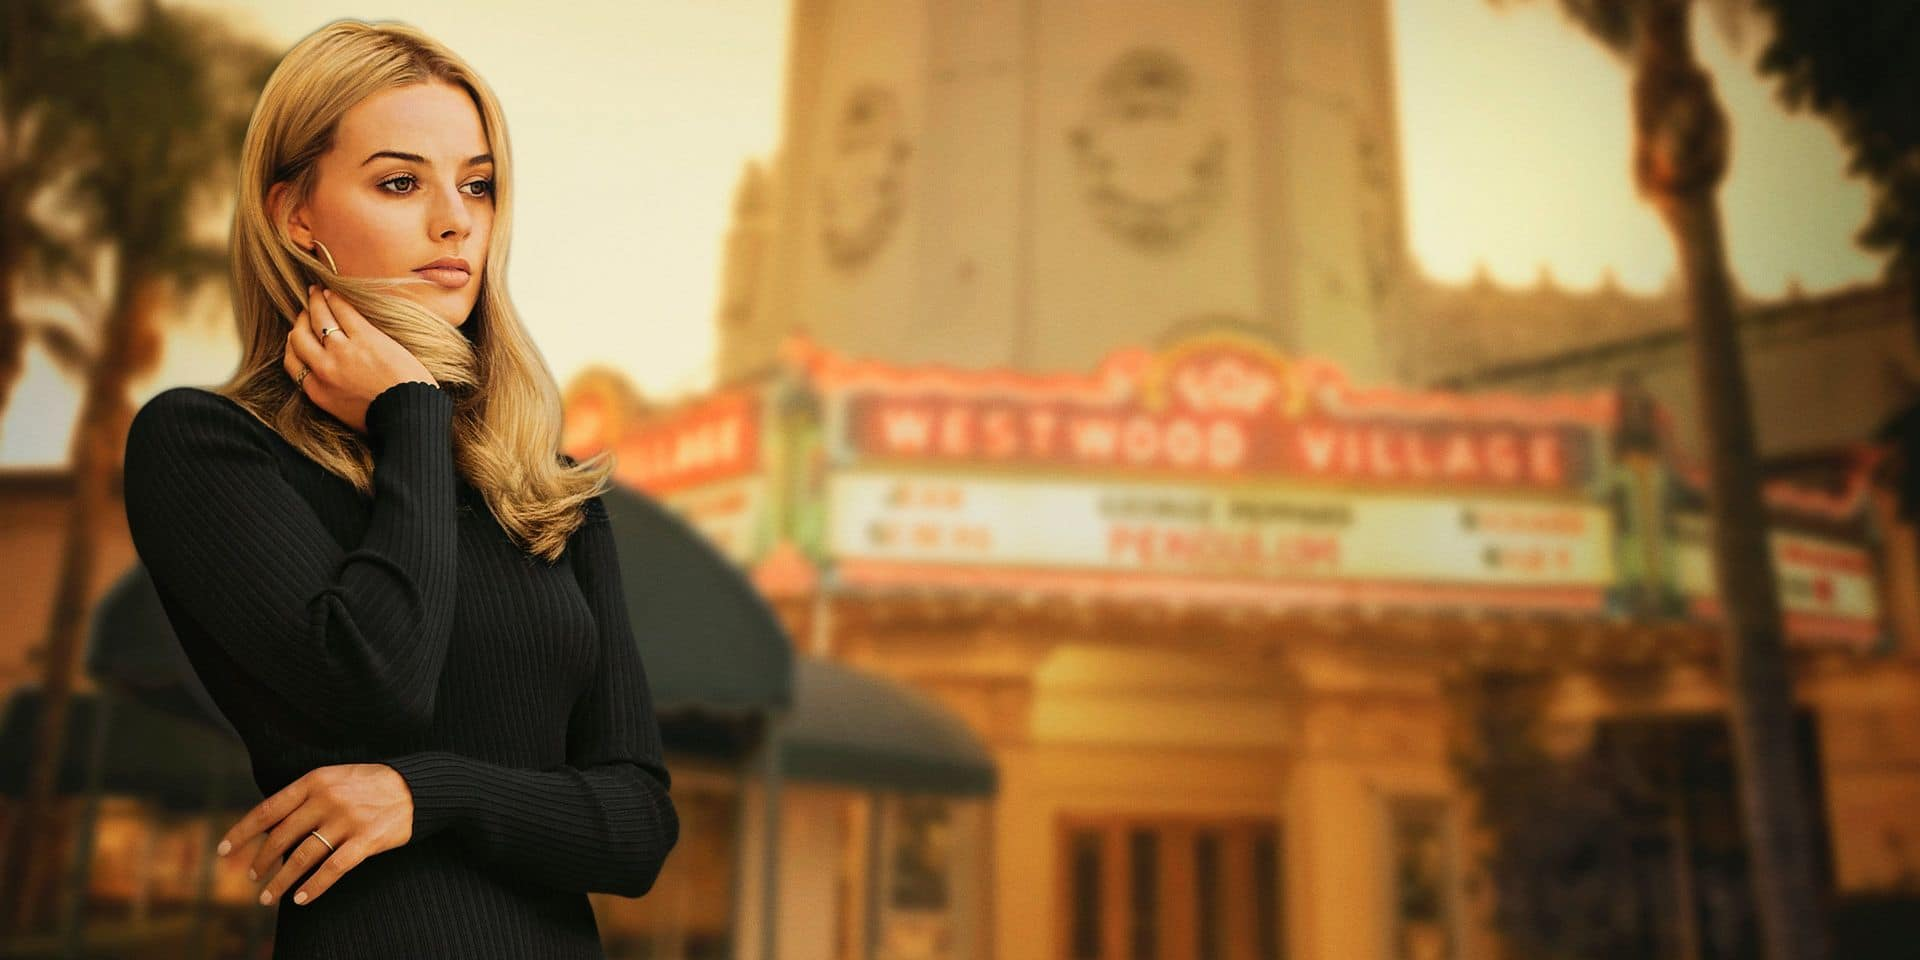 Sur les traces de Quentin Tarantino à Hollywood